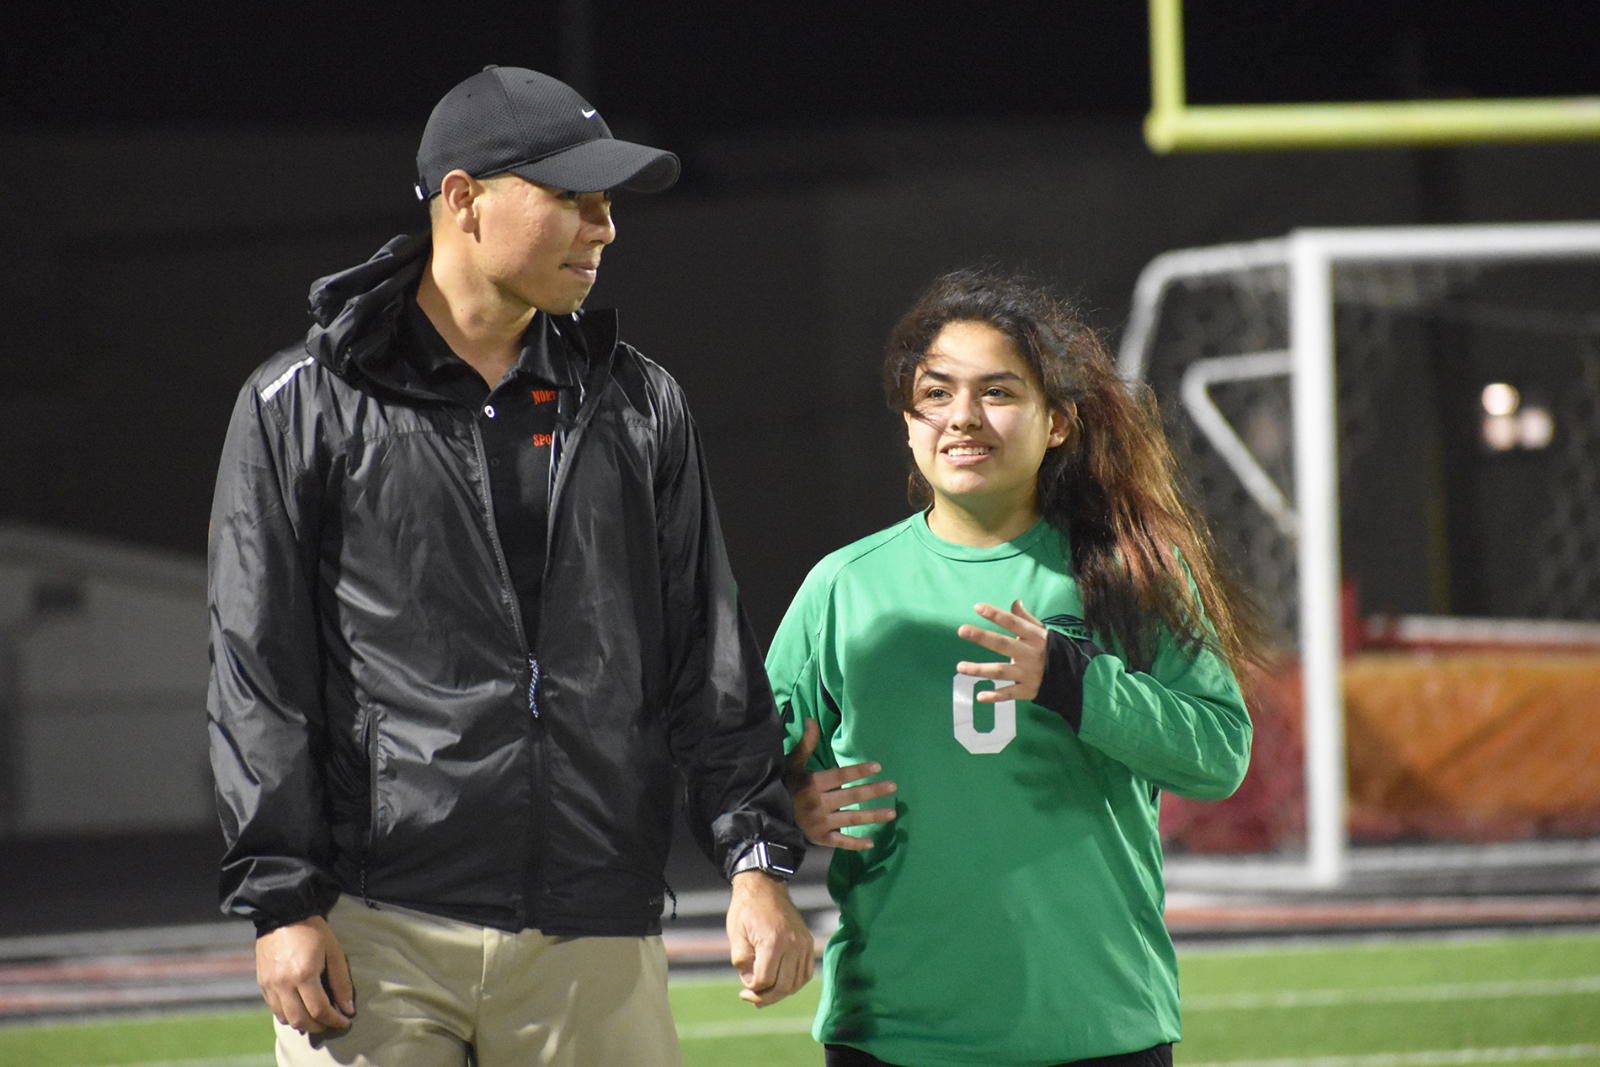 North Dallas athletic trainer Nicholas Saldivar receives recognition